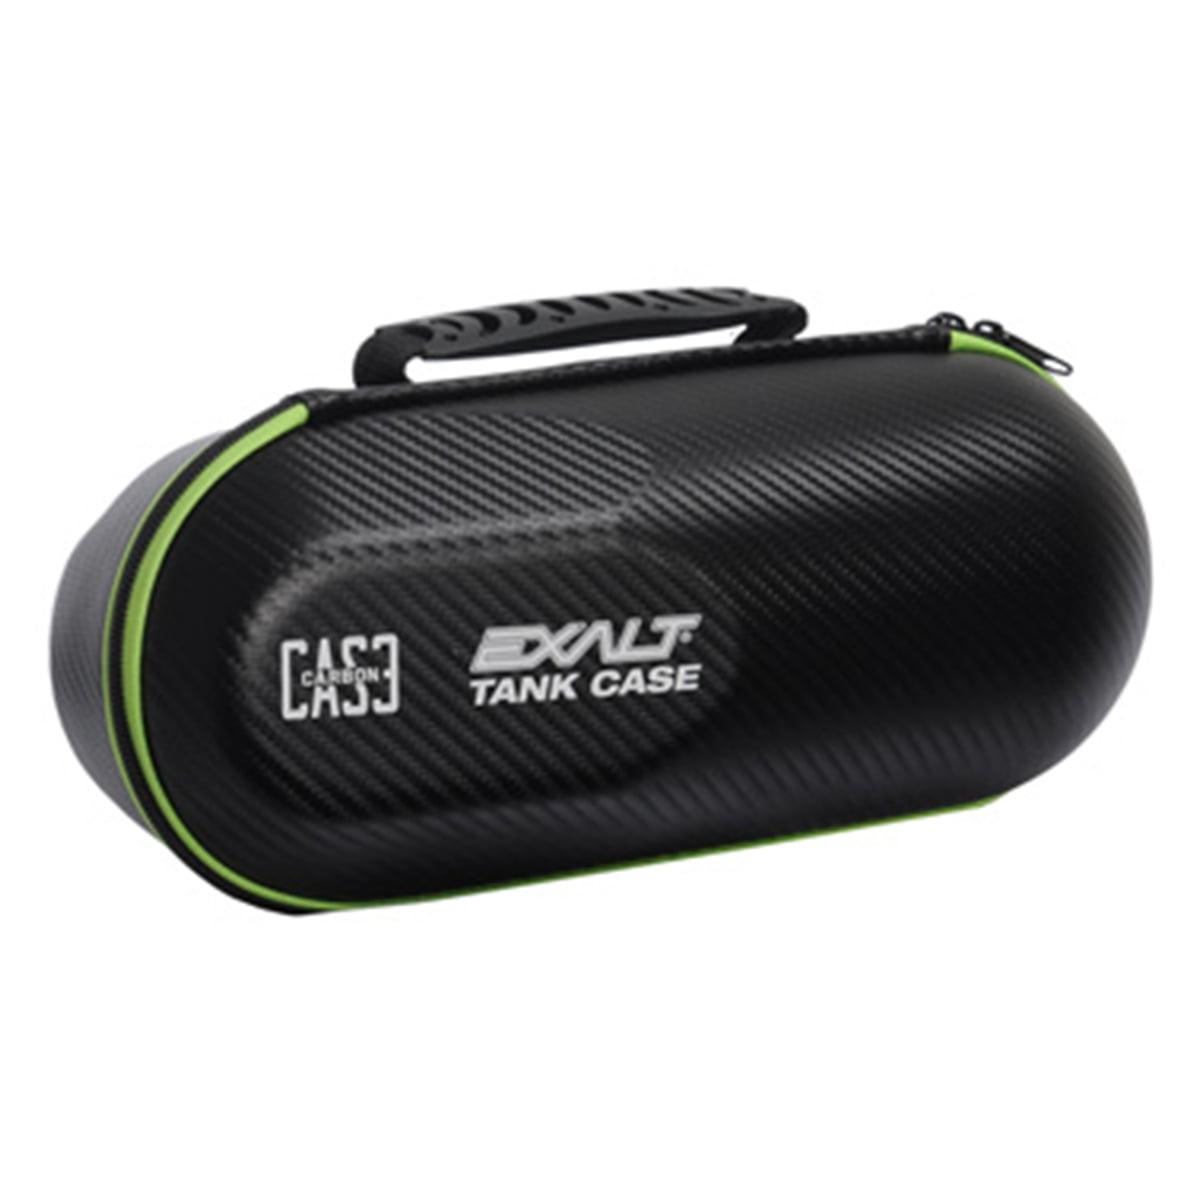 Exalt Paintball Carbon Series Tank Case - Black / Lime